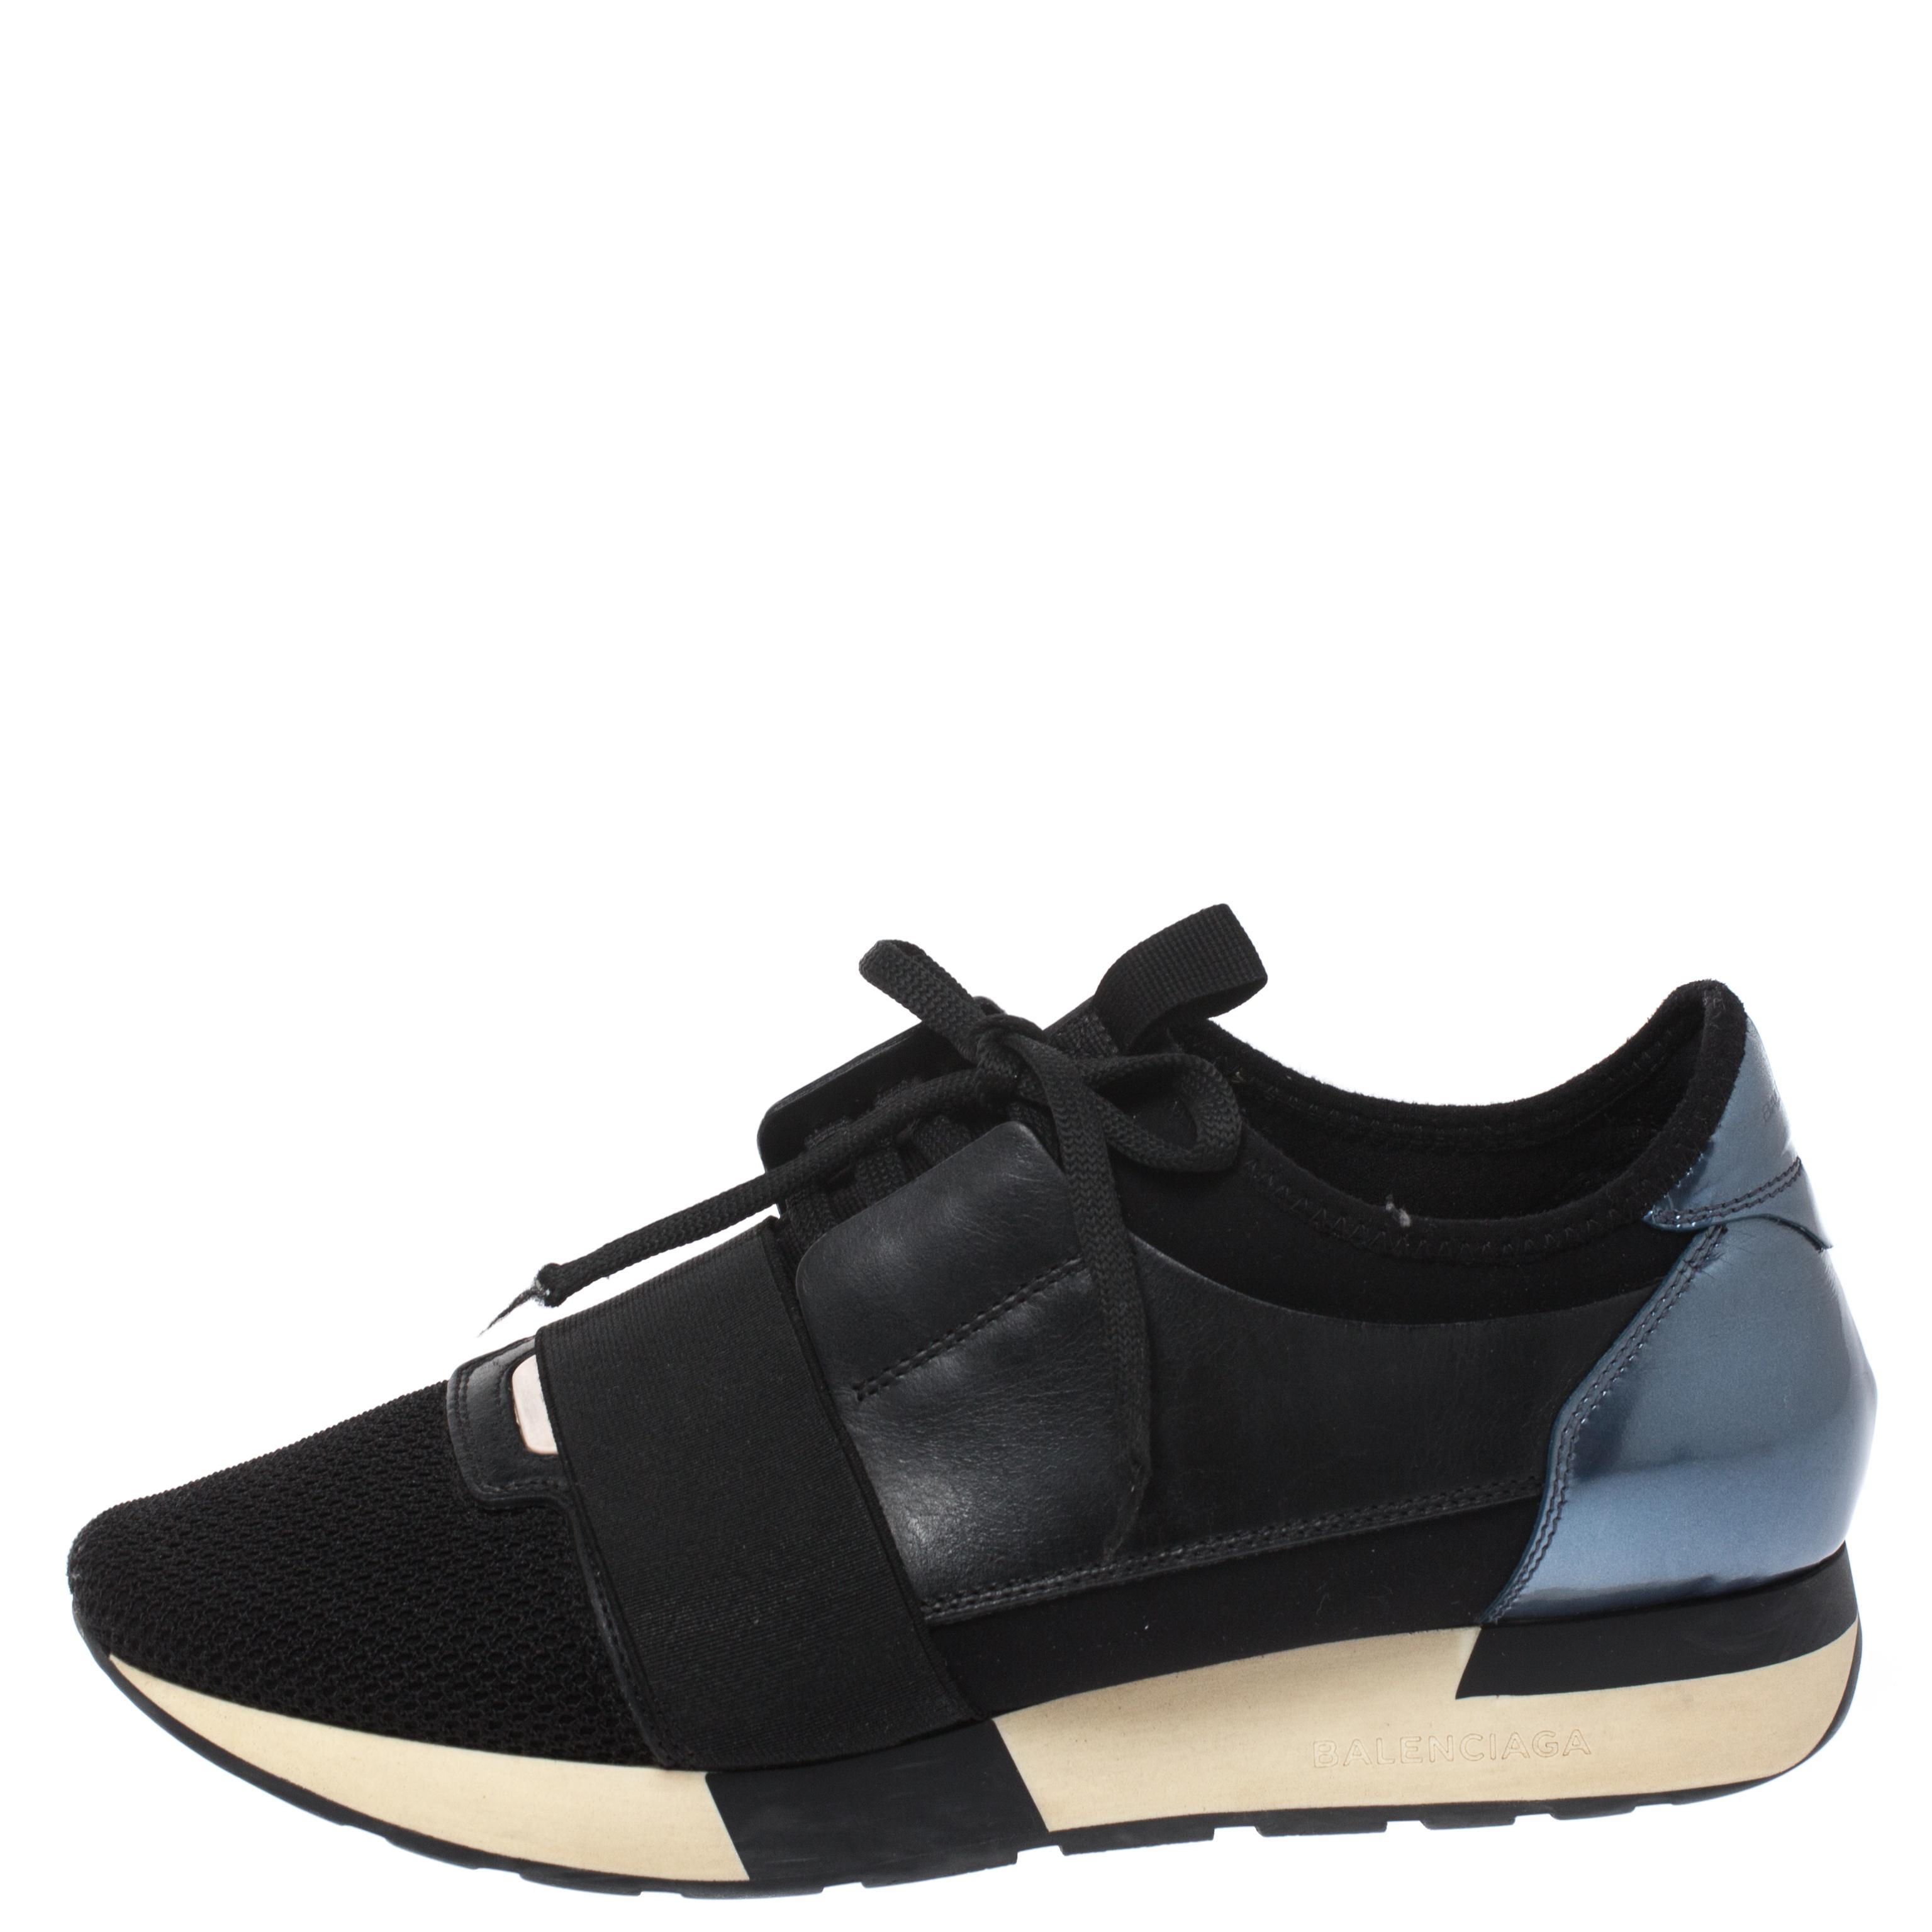 Balenciaga Black Leather And Mesh Race